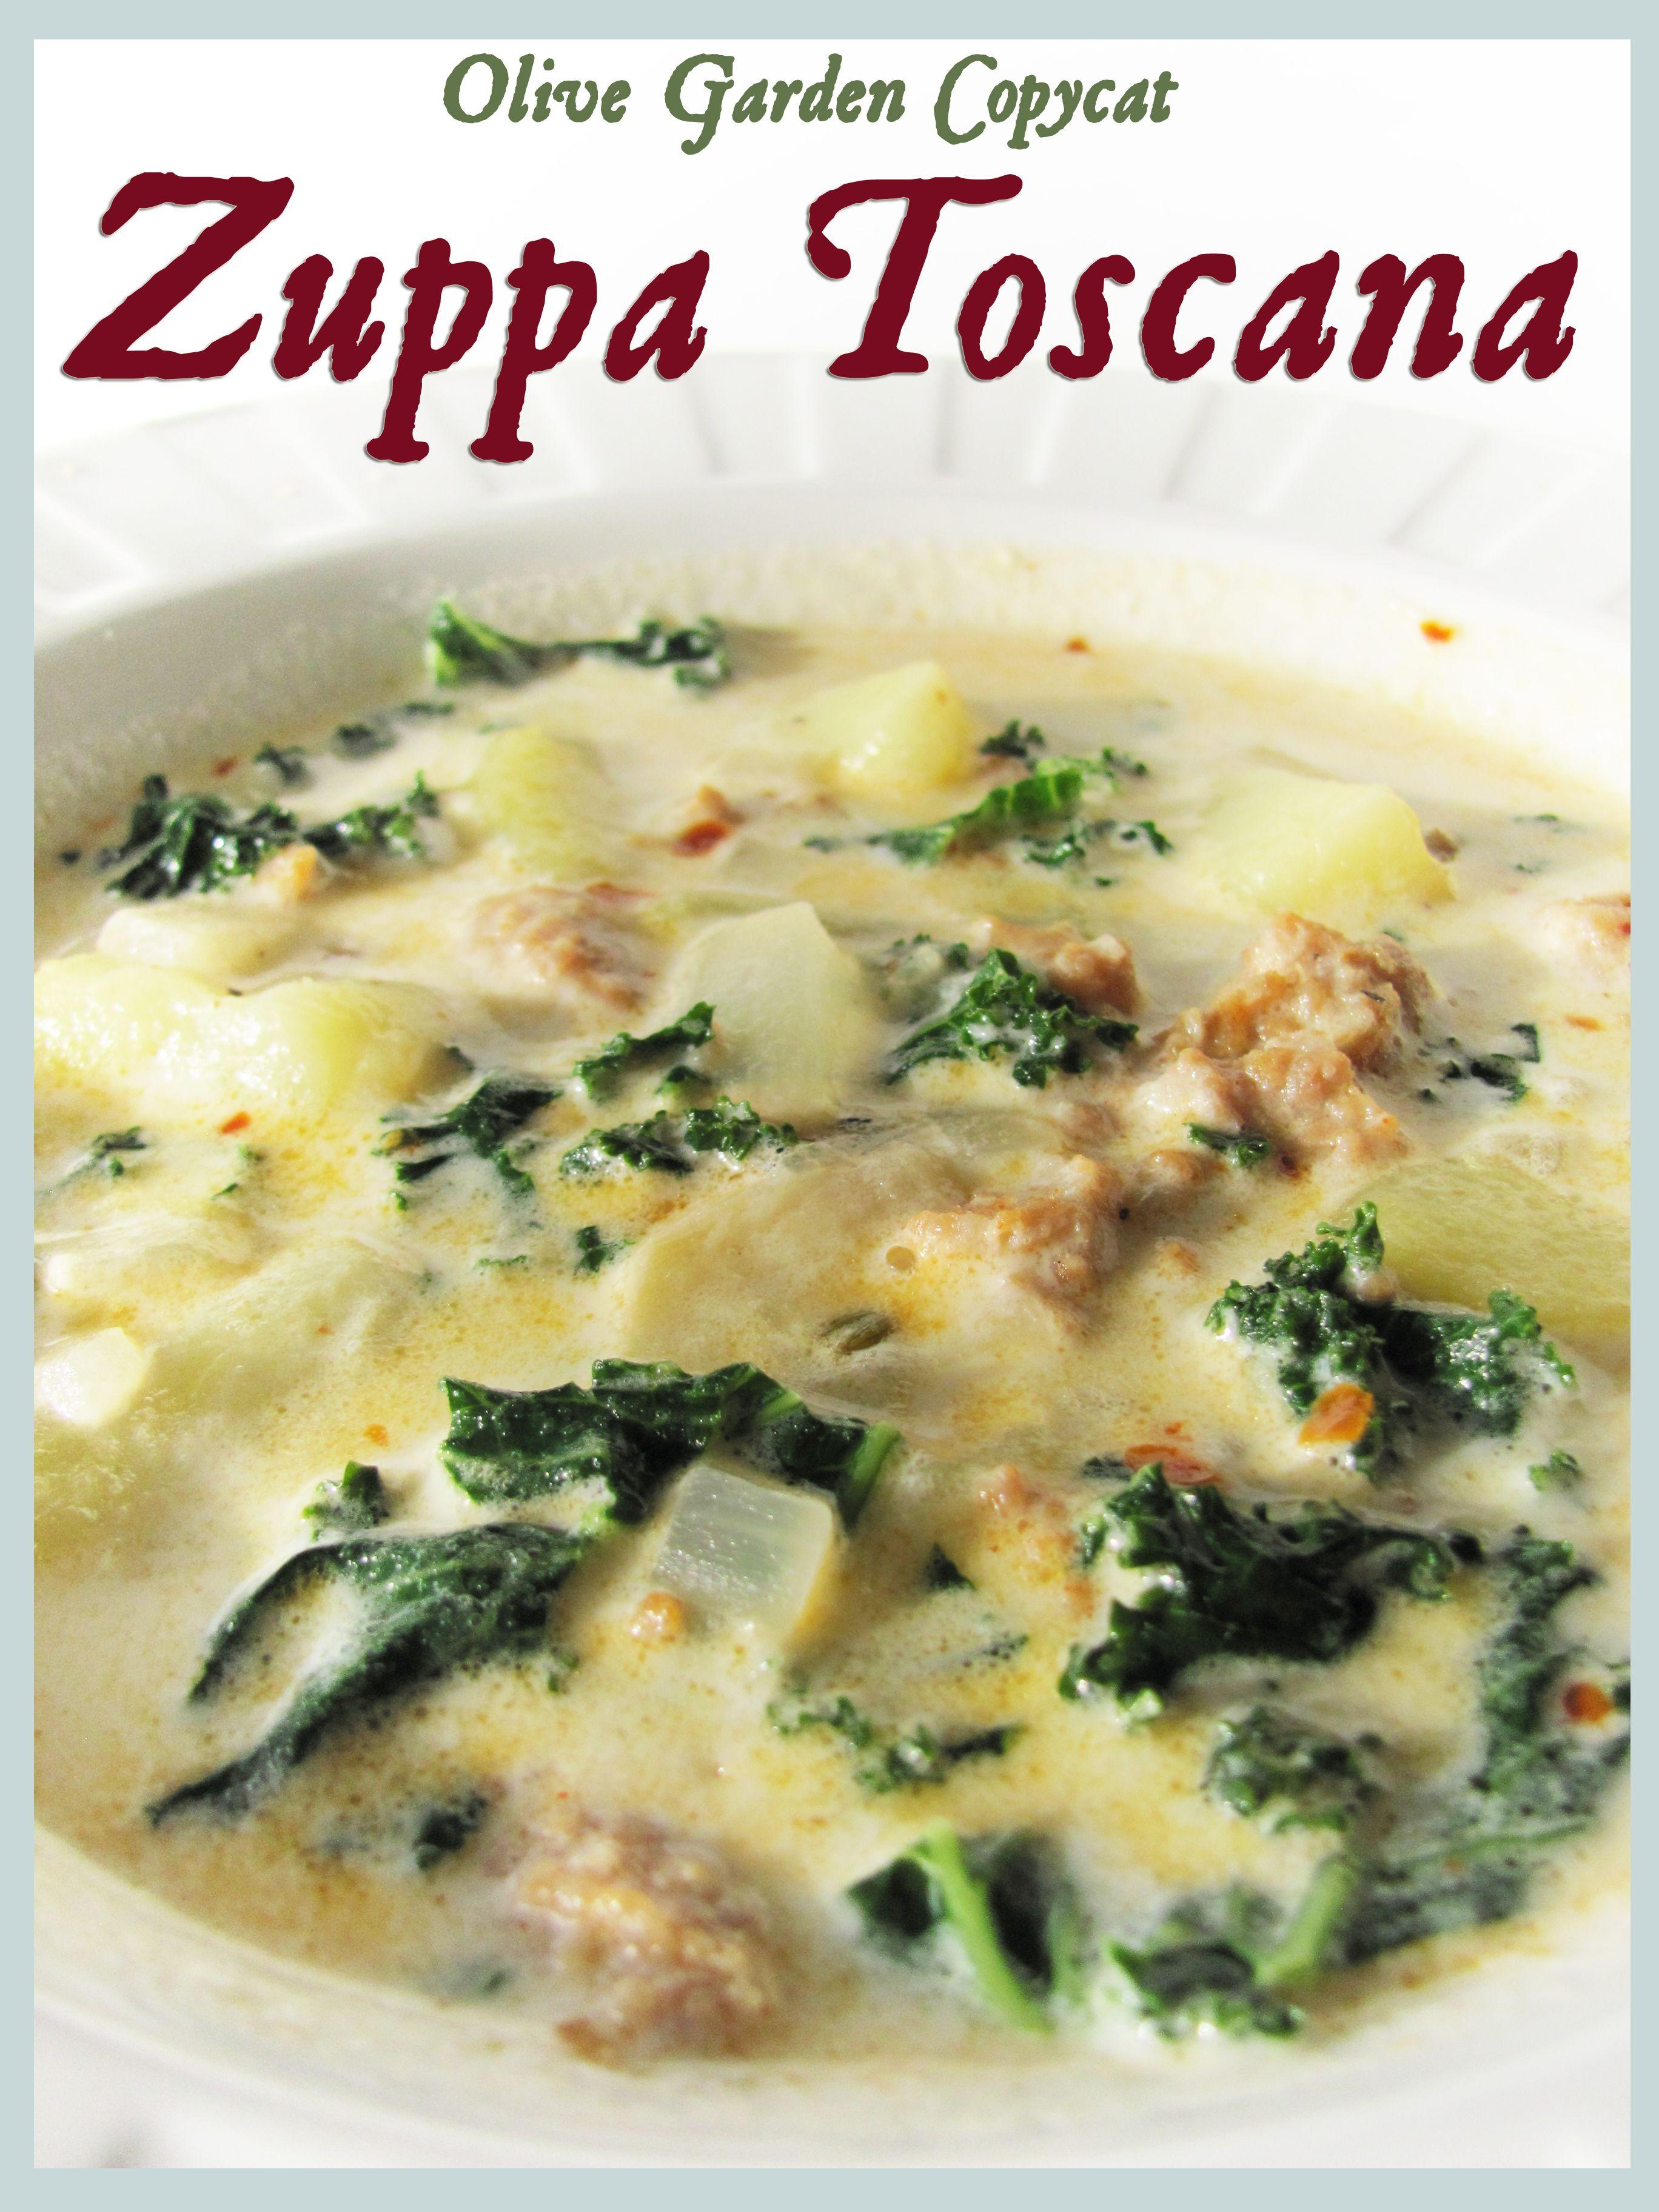 Olive Garden Copycat Zuppa Toscana Recipe Zuppa